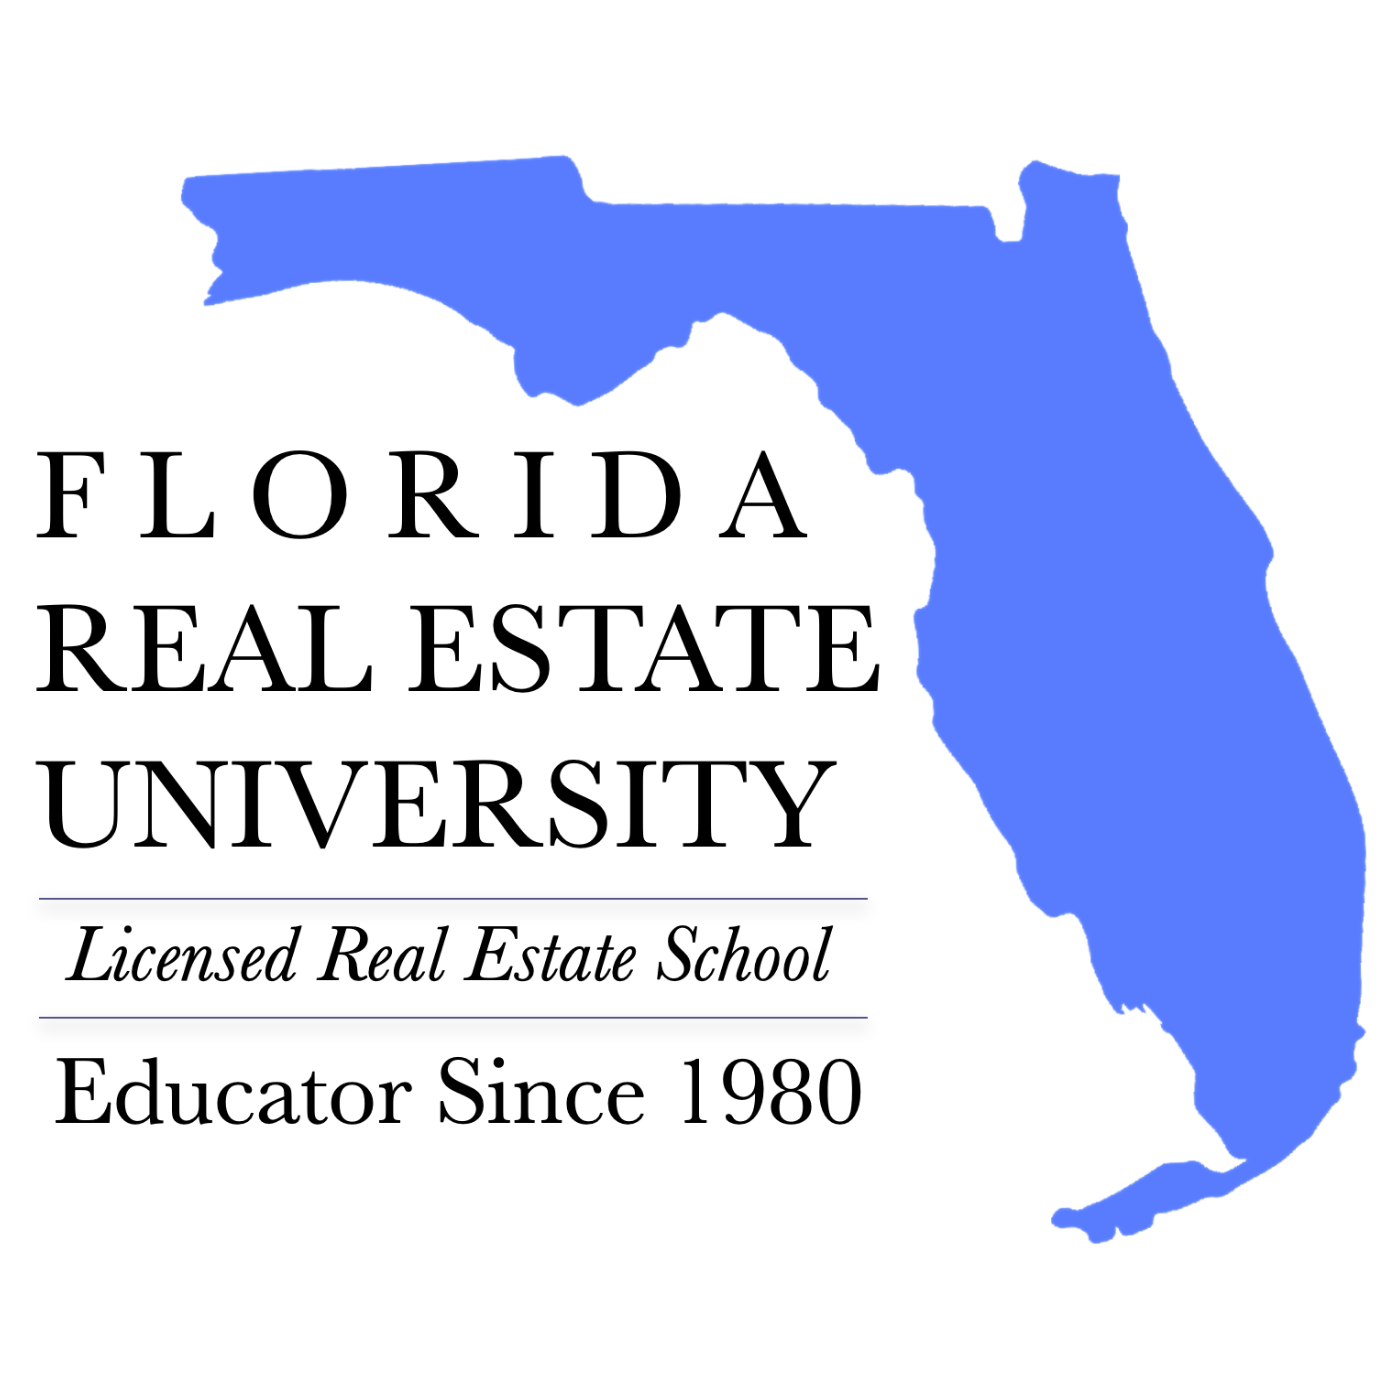 Artwork for podcast FloridaRealEstateUniversity.com